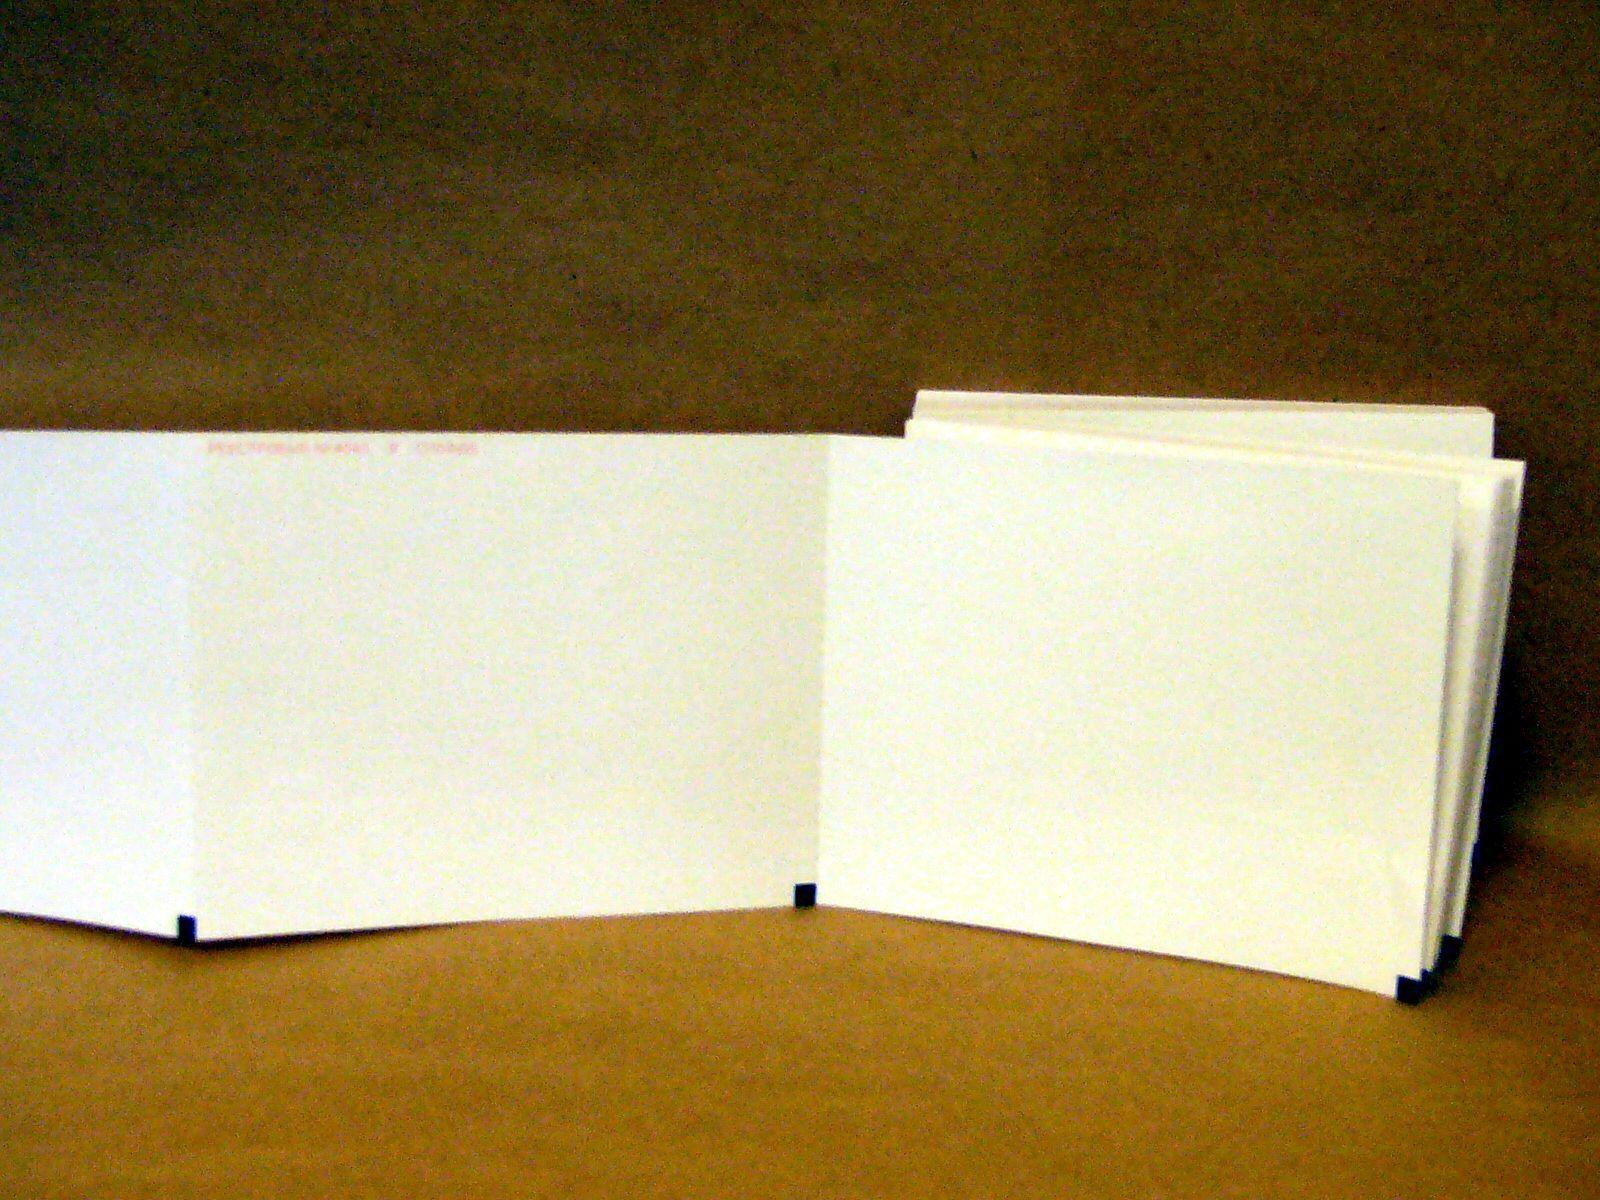 110х140х142, бумага ЭКГ для Nihon Kohden Cardiofax 9010, ЮНИ-2, реестр 4040